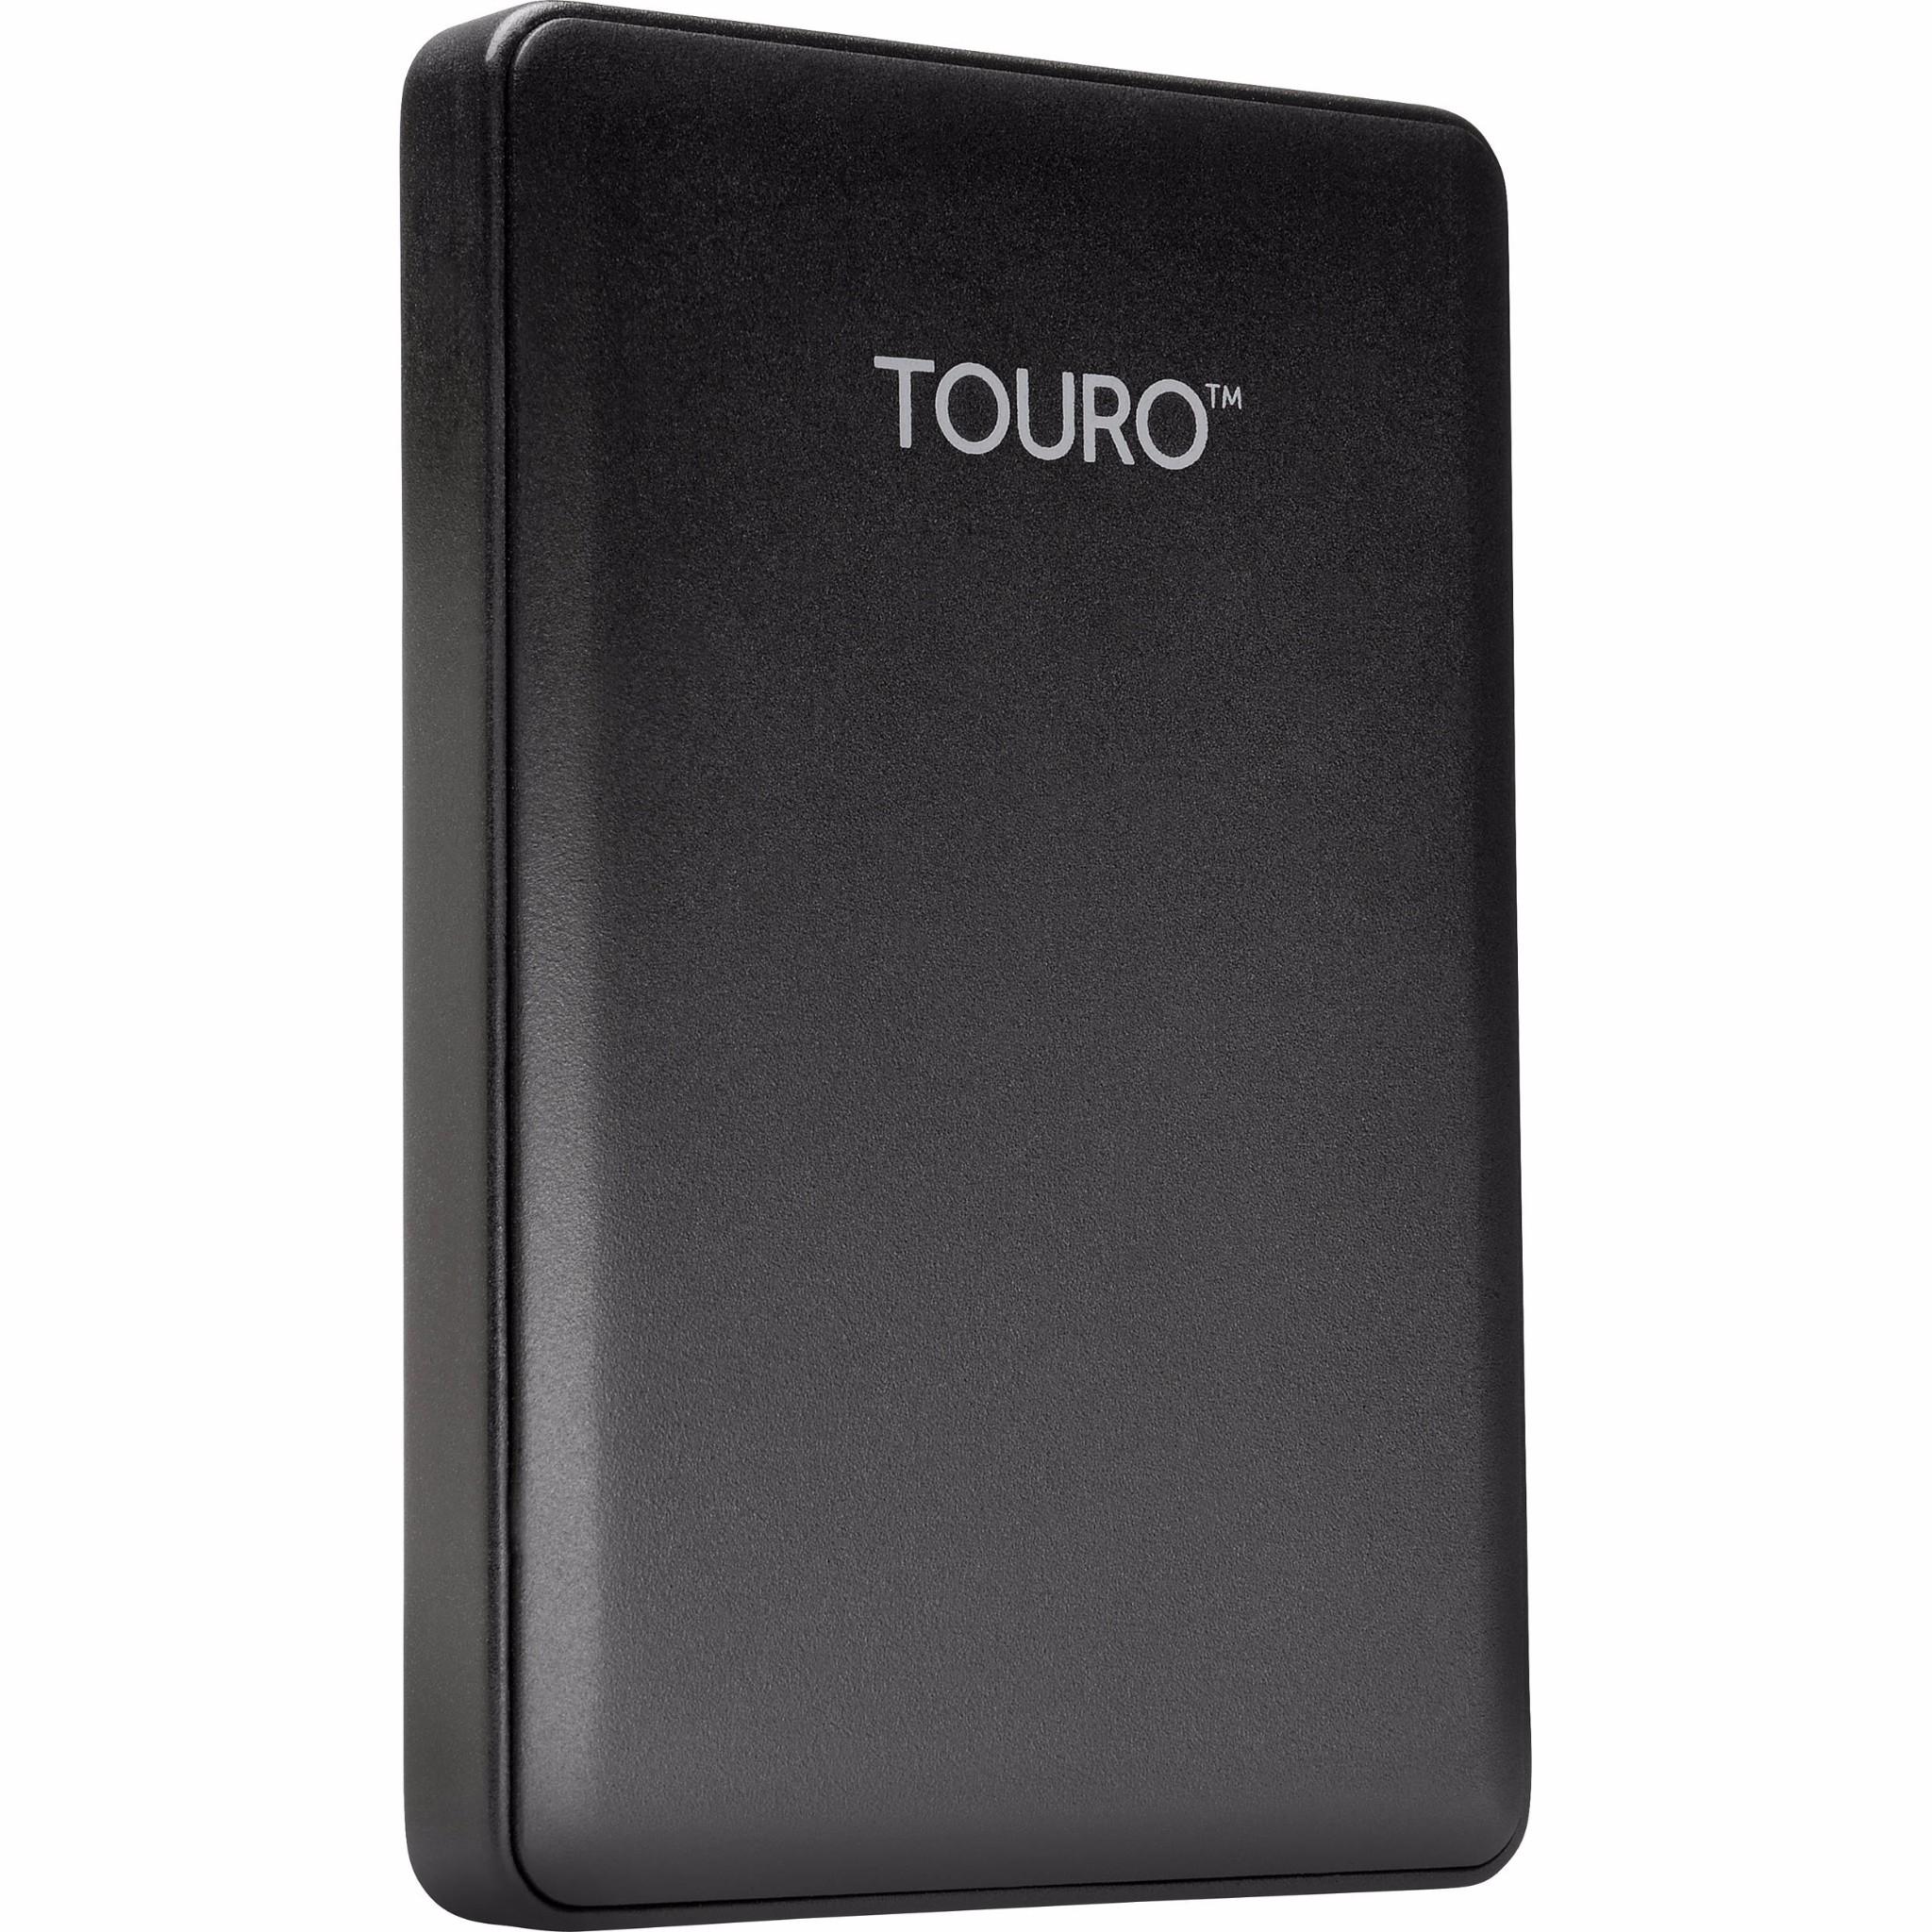 Jual HGST HDD External 25 Touro 1TB